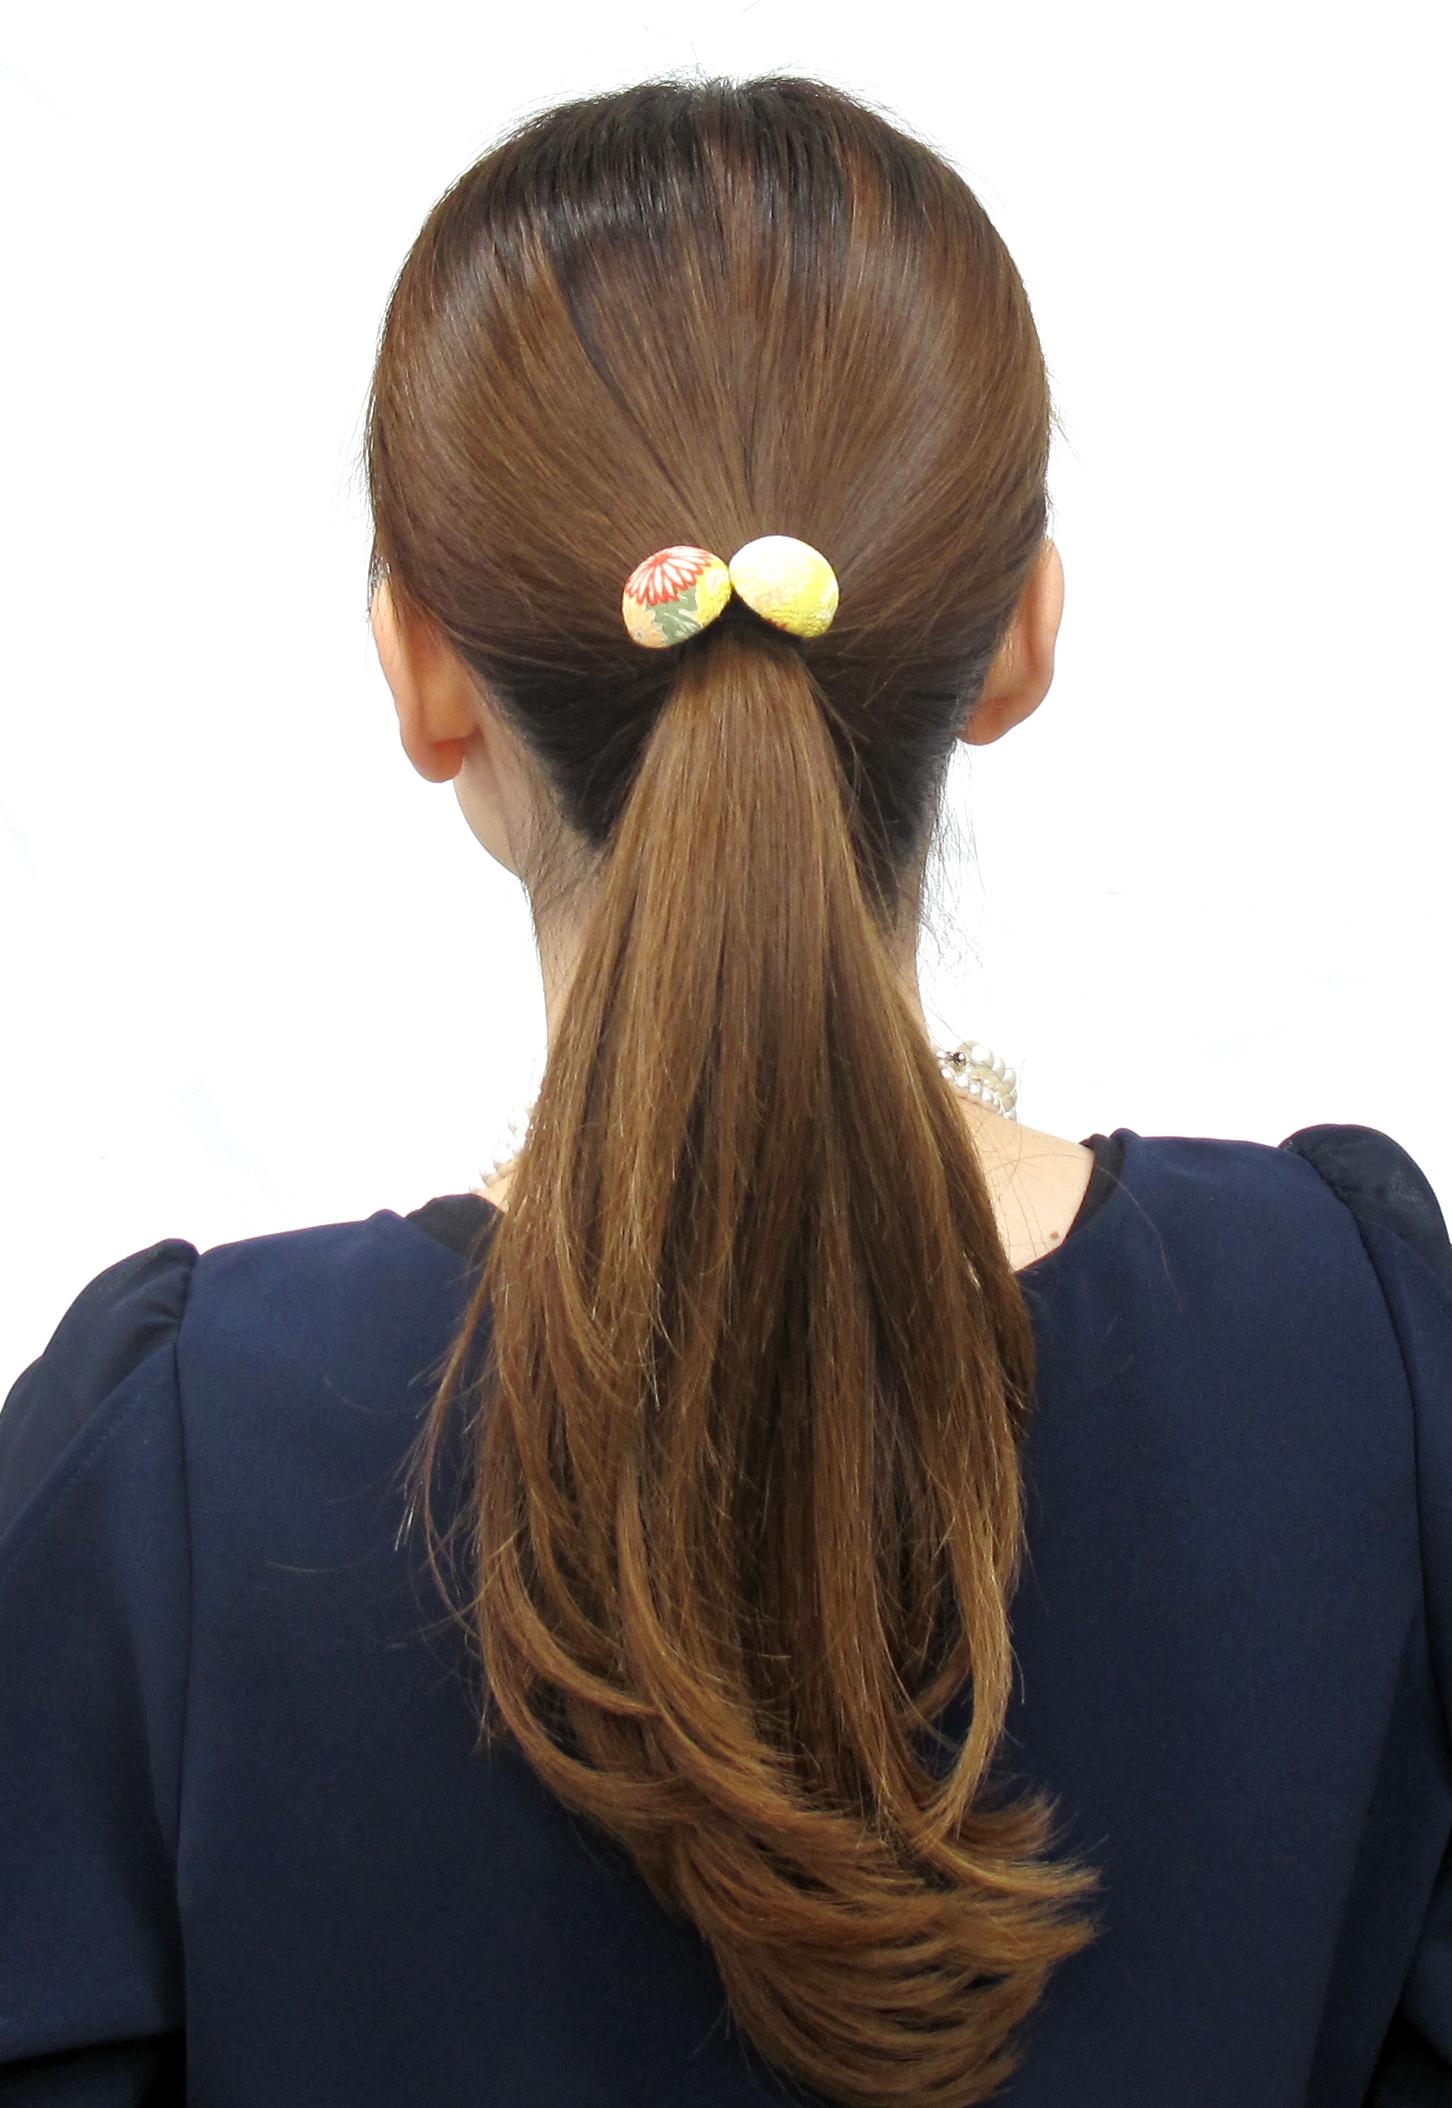 elastique cheveux bouton japon tendance. Black Bedroom Furniture Sets. Home Design Ideas